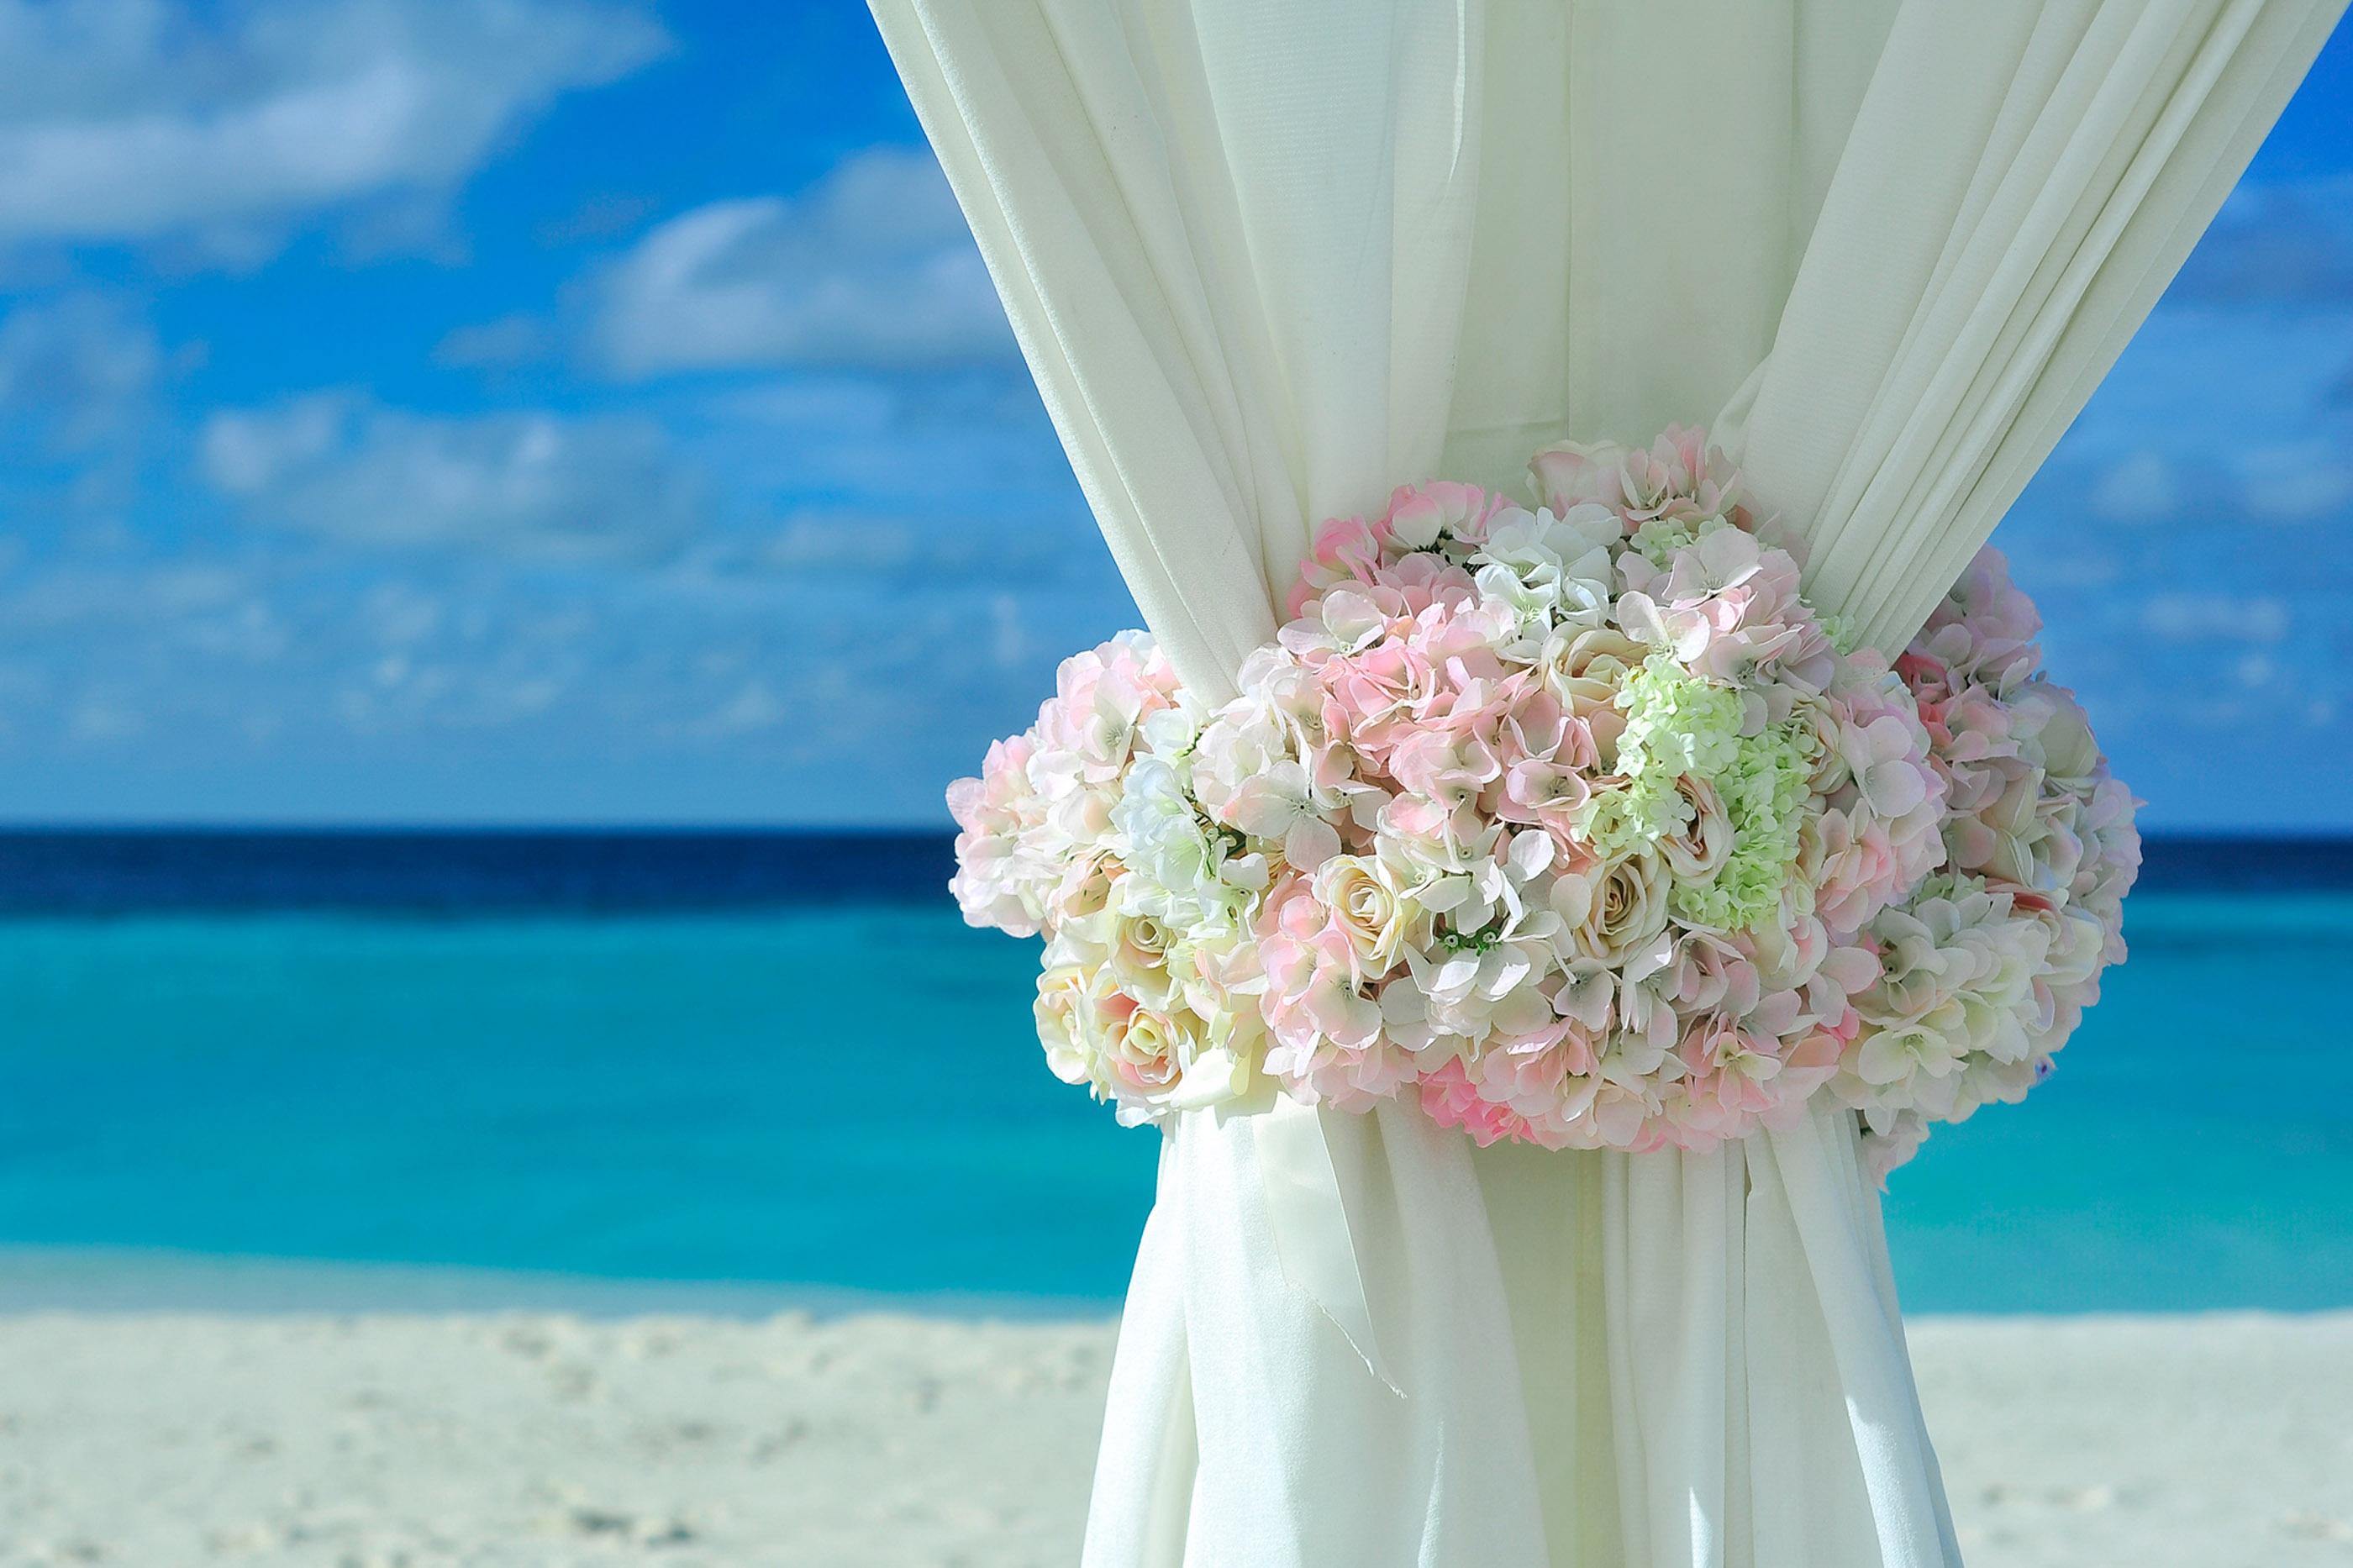 Free Images : beach, sea, water, sand, ocean, plant, woman, petal ...